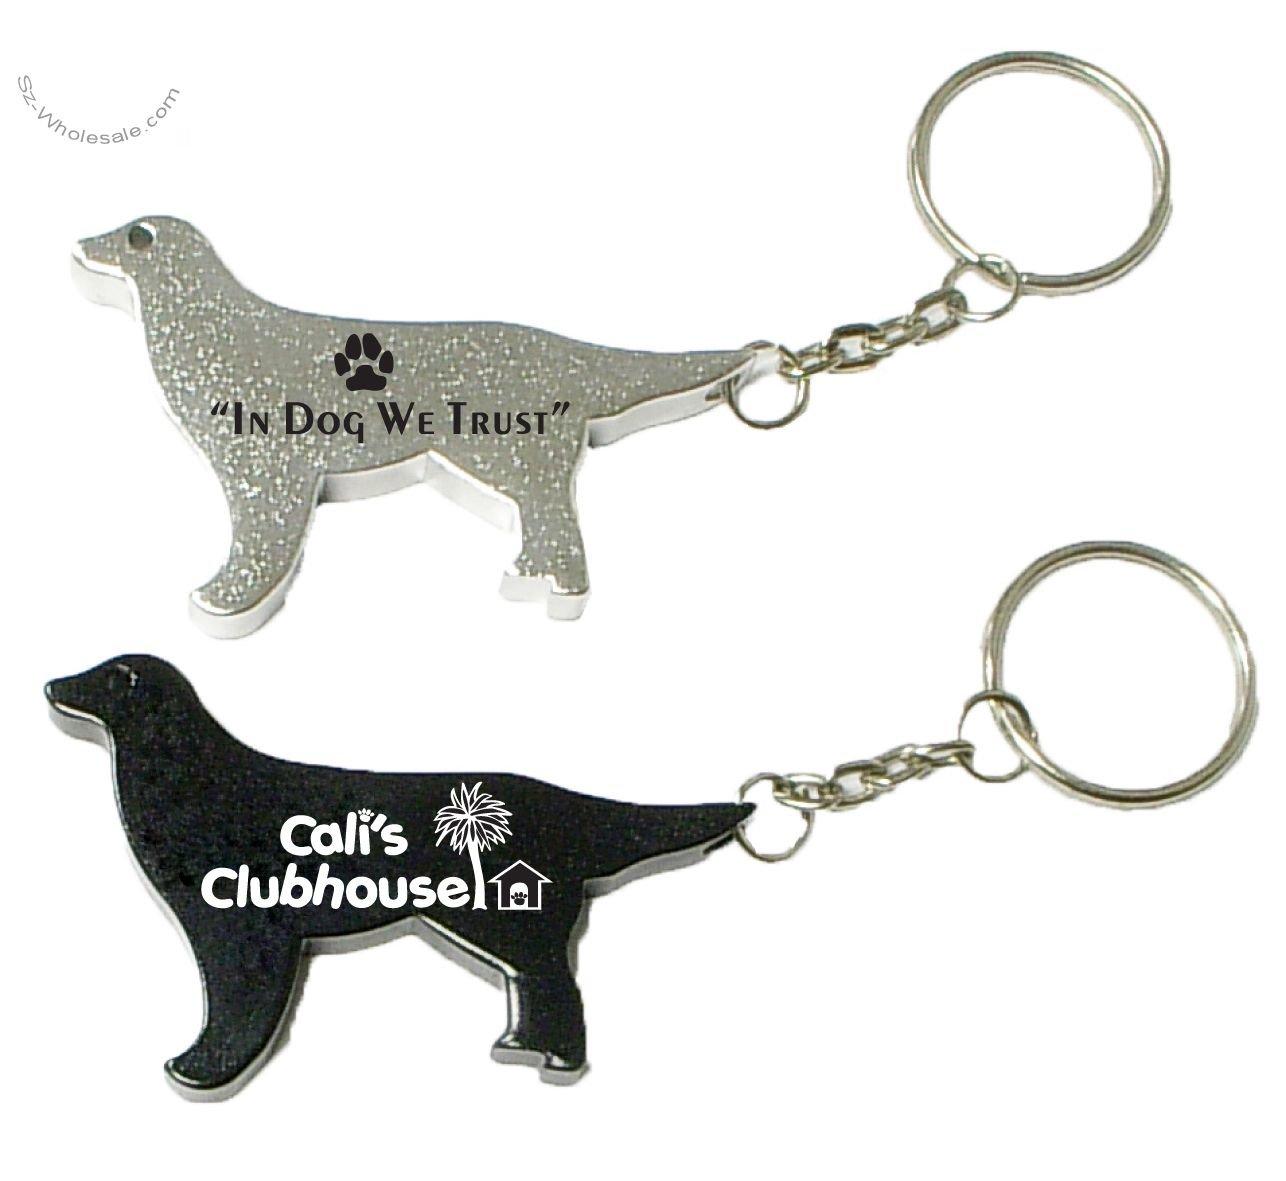 dog shape key chain bottle opener